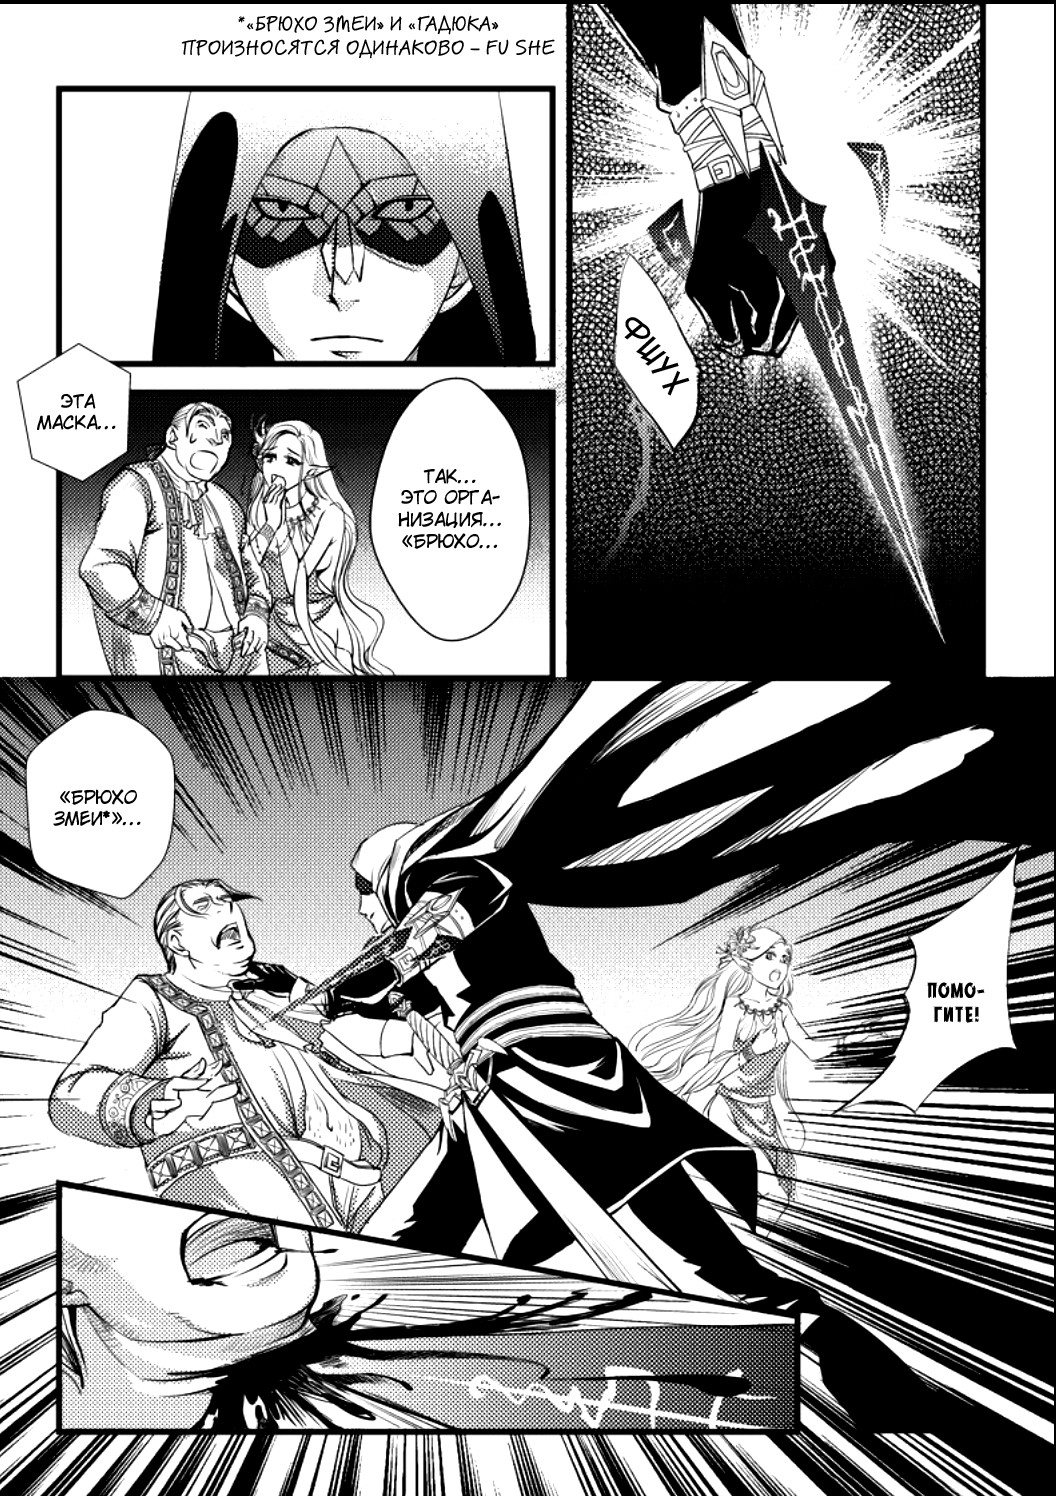 https://r1.ninemanga.com/comics/pic2/42/19946/220569/1428886367831.jpg Page 2